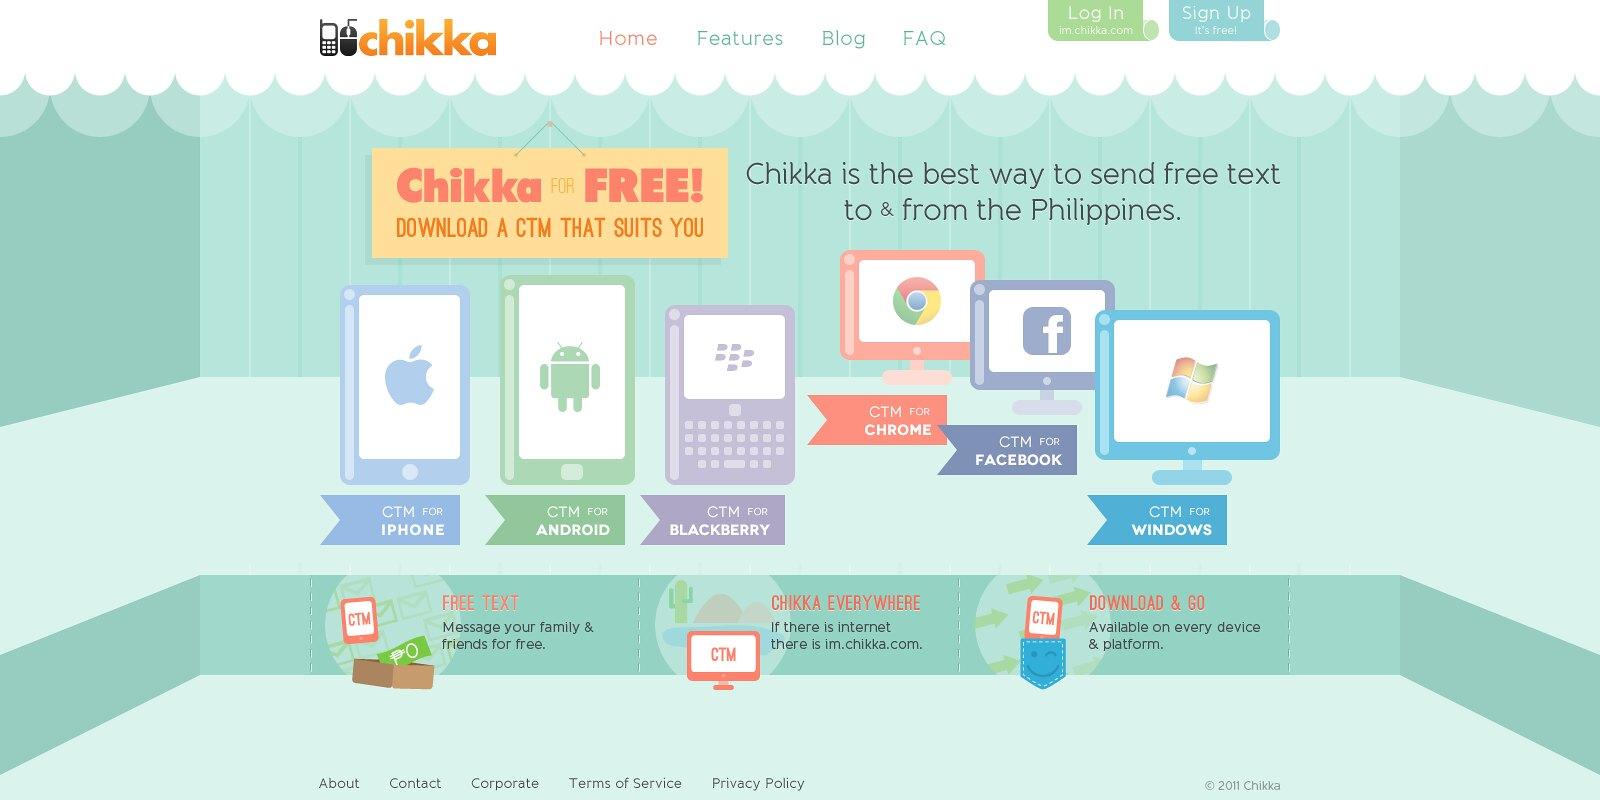 Chikka - Website - Study 3 - 2011-08-19